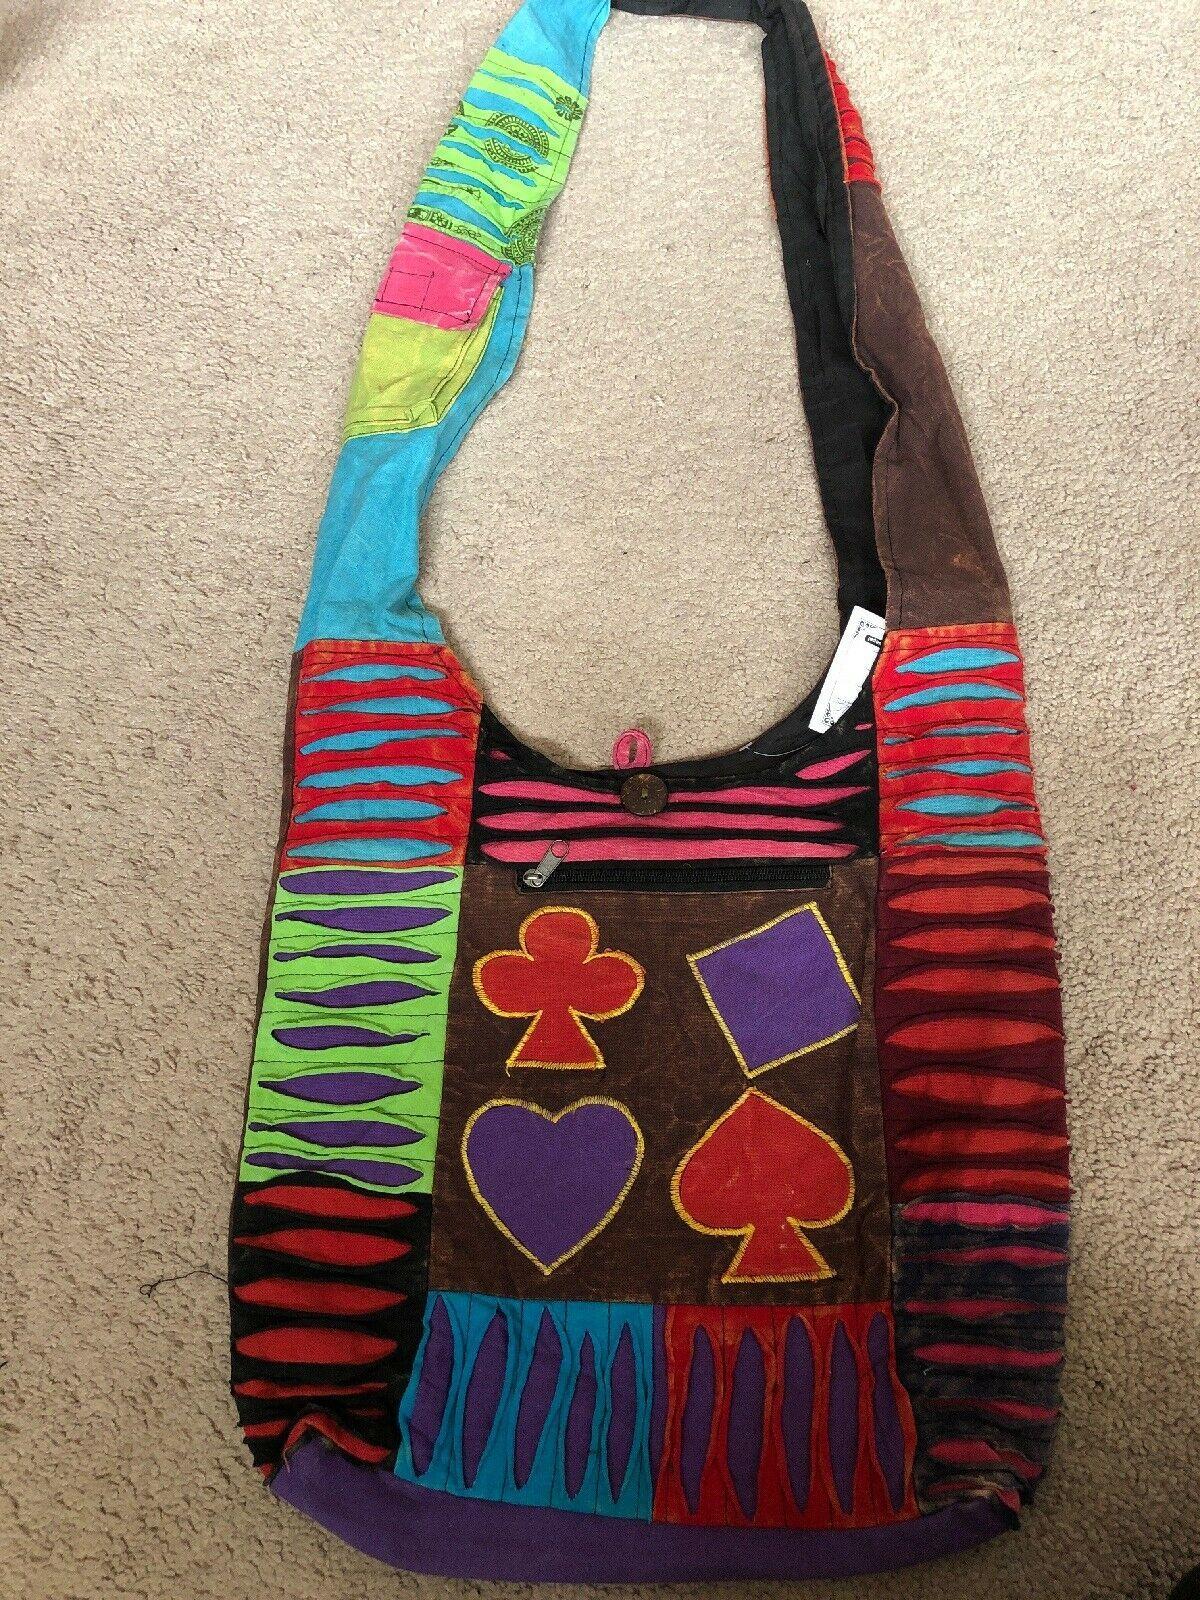 #1 Gift Nepal Hobo Bag, Hippie Cotton bag, Boho Purses, Nepali handmade Tie dye